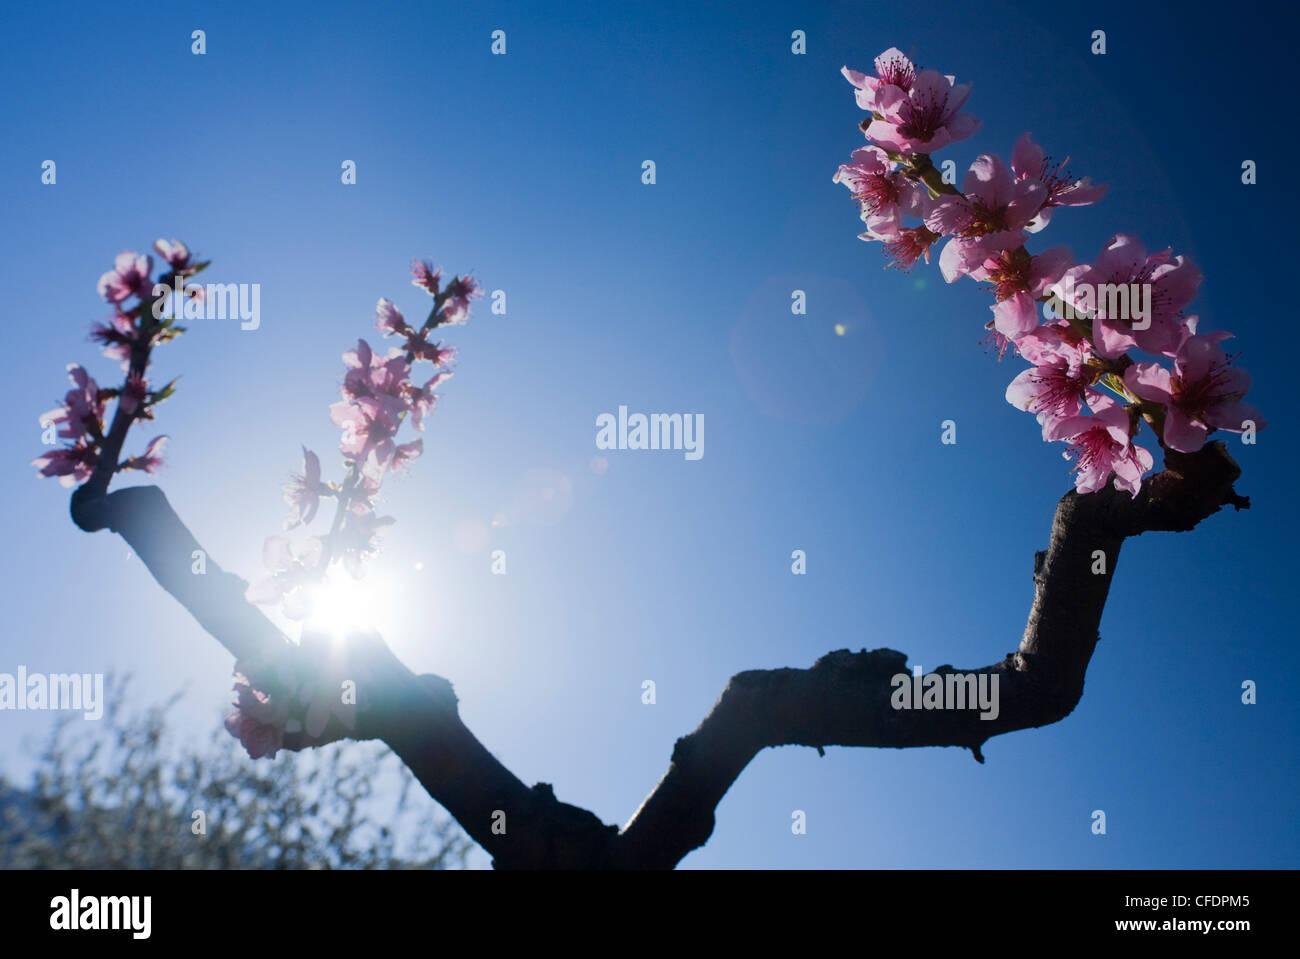 Blooming fruit tree in the sunlight, Wachau, Lower Austria, Austria, Europe - Stock Image